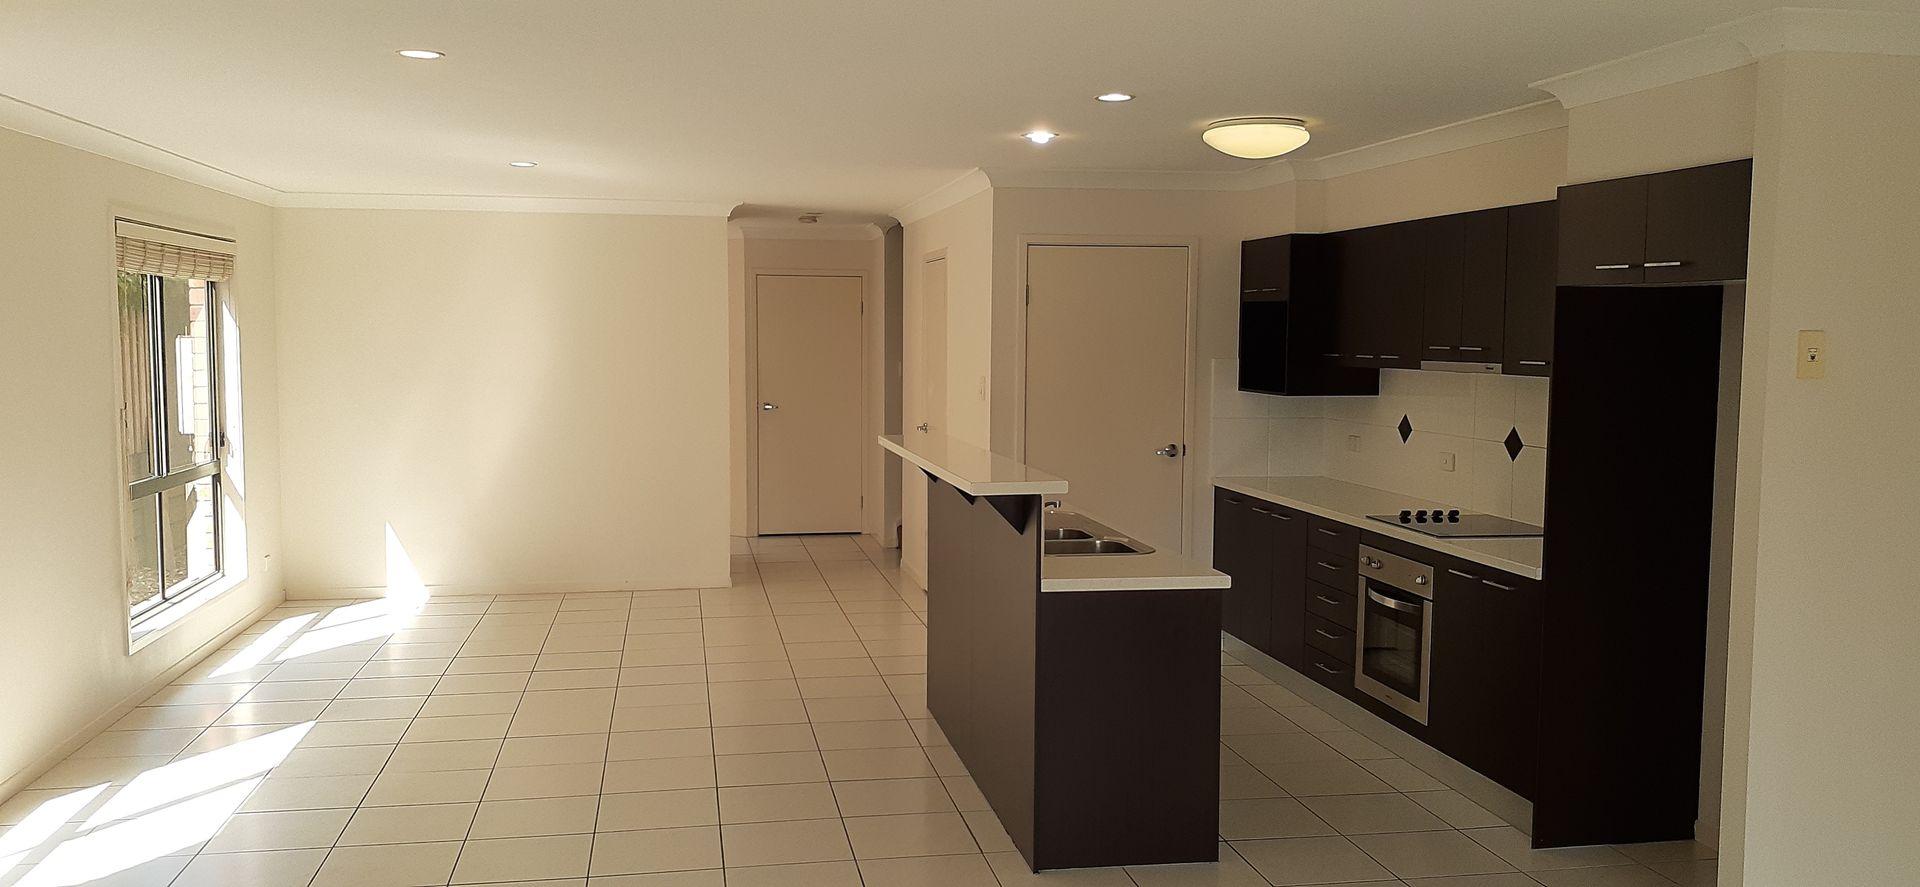 2/16 Pecan Drive, Upper Coomera QLD 4209, Image 2